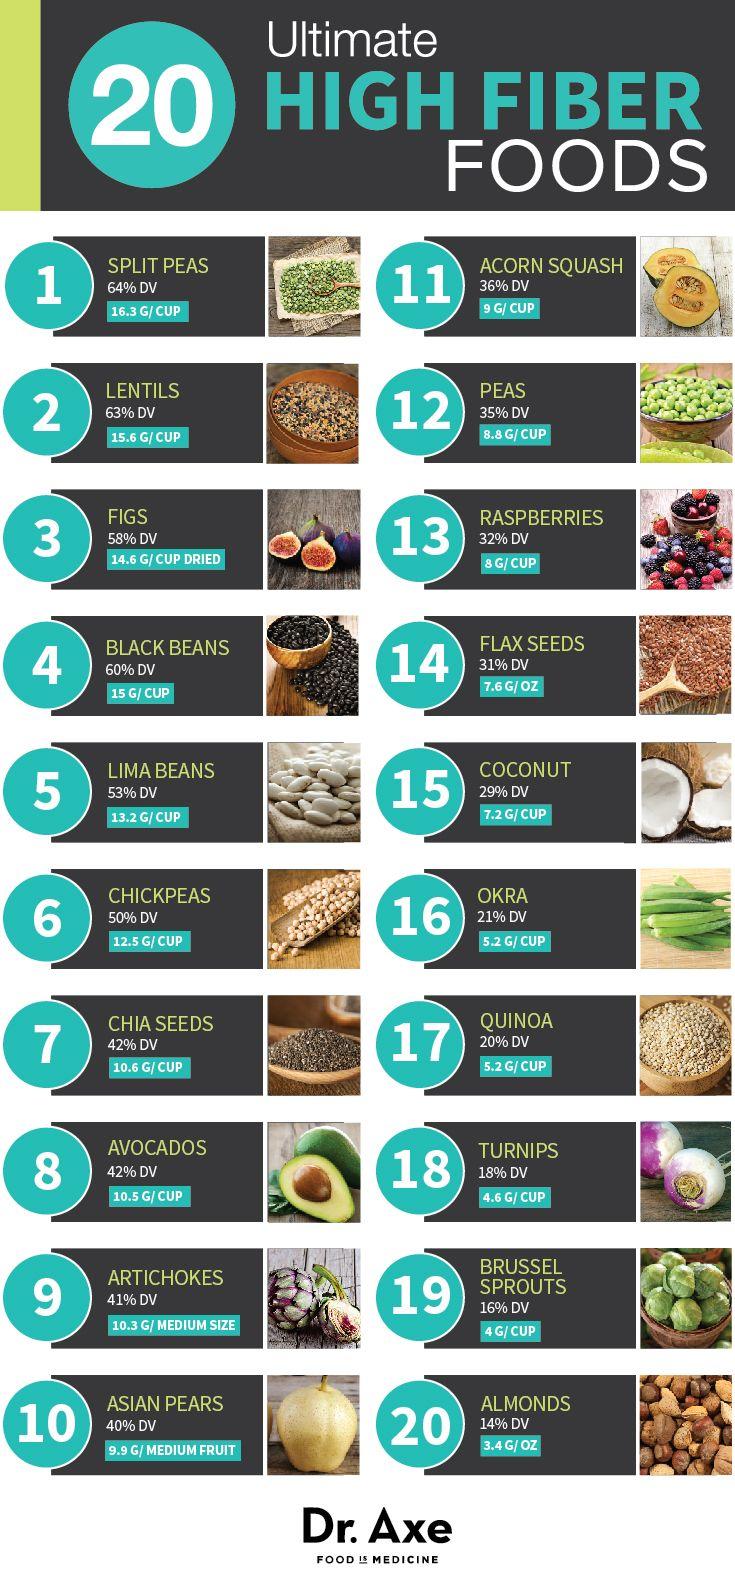 20 Ultimate High Fiber Foods High Fiber Foods High Fiber Diet Fiber Foods